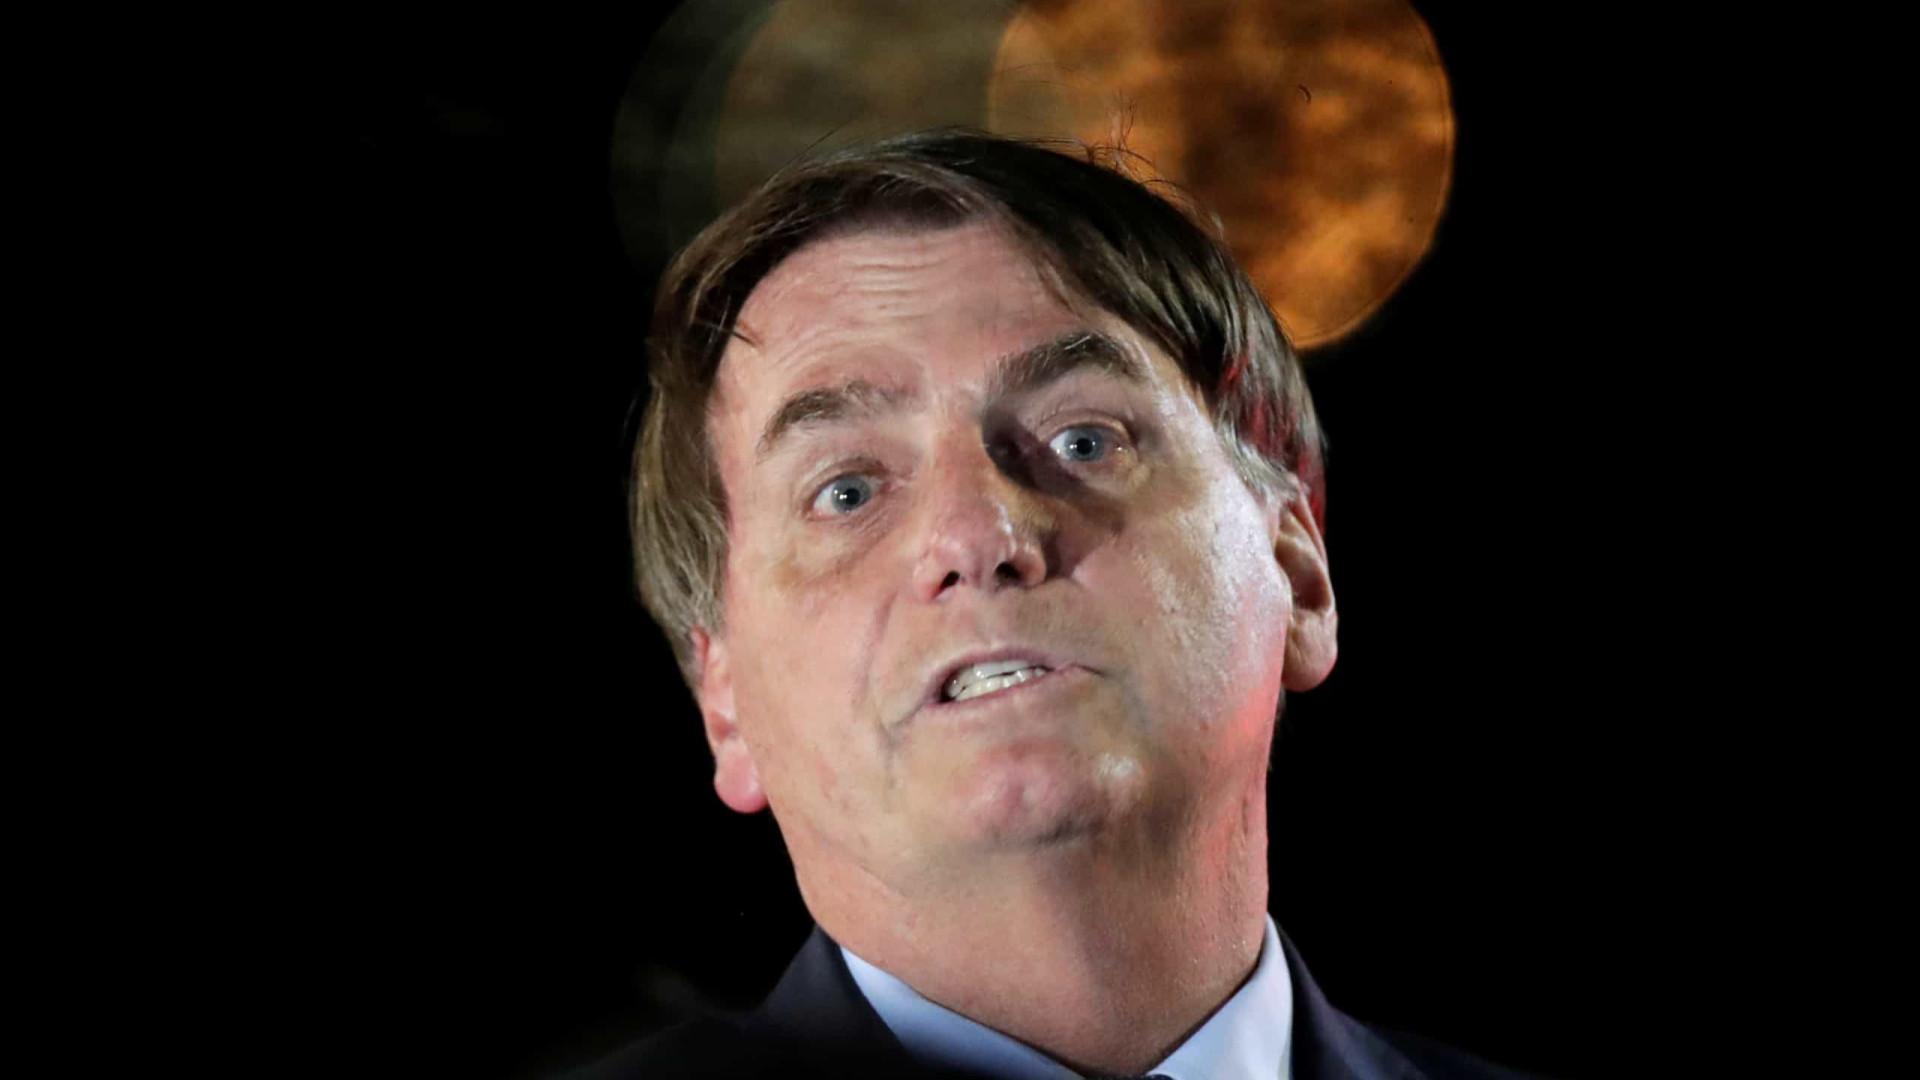 Bolsonaro posta vídeo que critica Mandetta e Doria e ataca isolamento